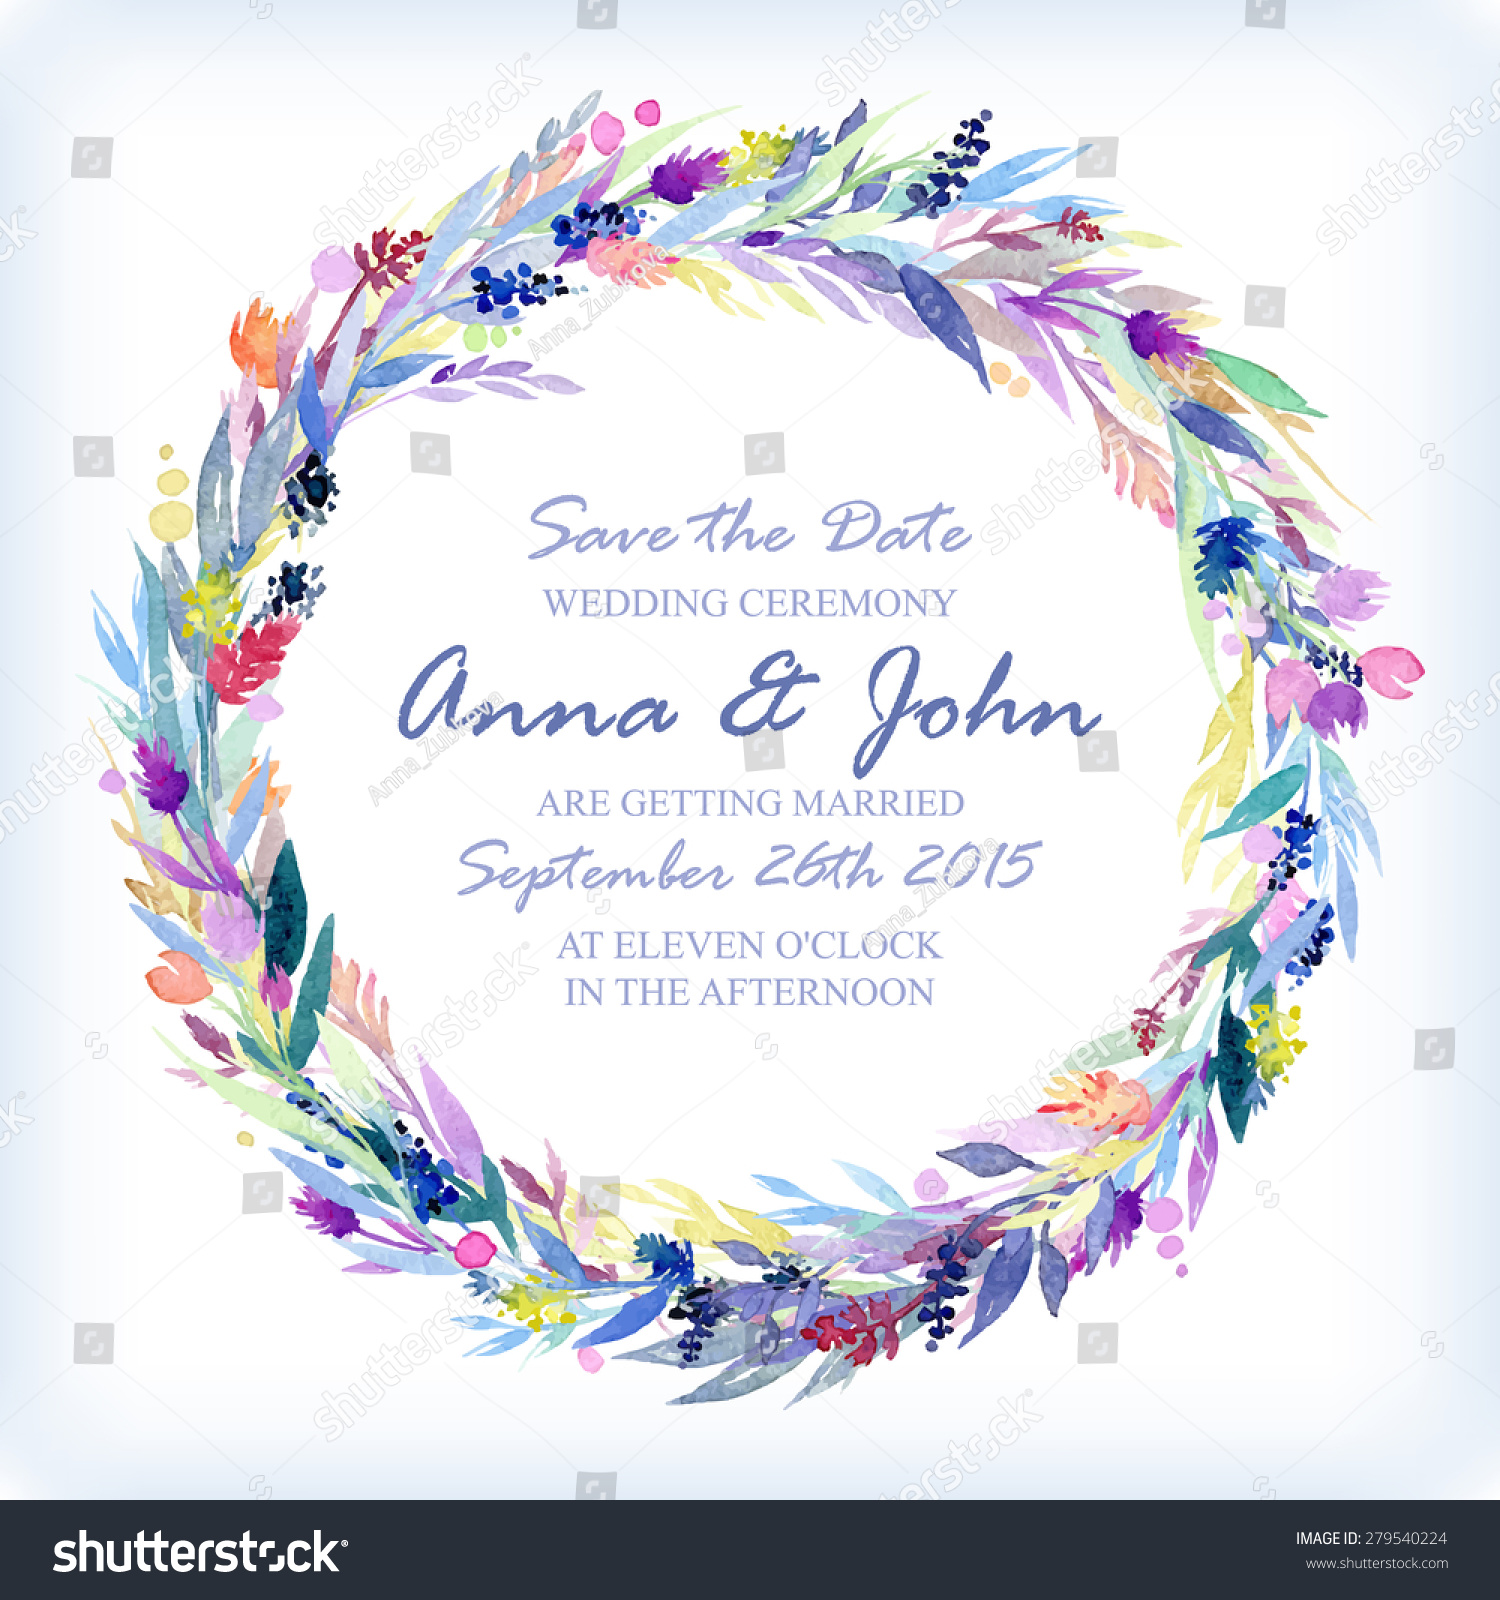 Wedding Invitation Design Template Watercolor Floral Stock Vector ...